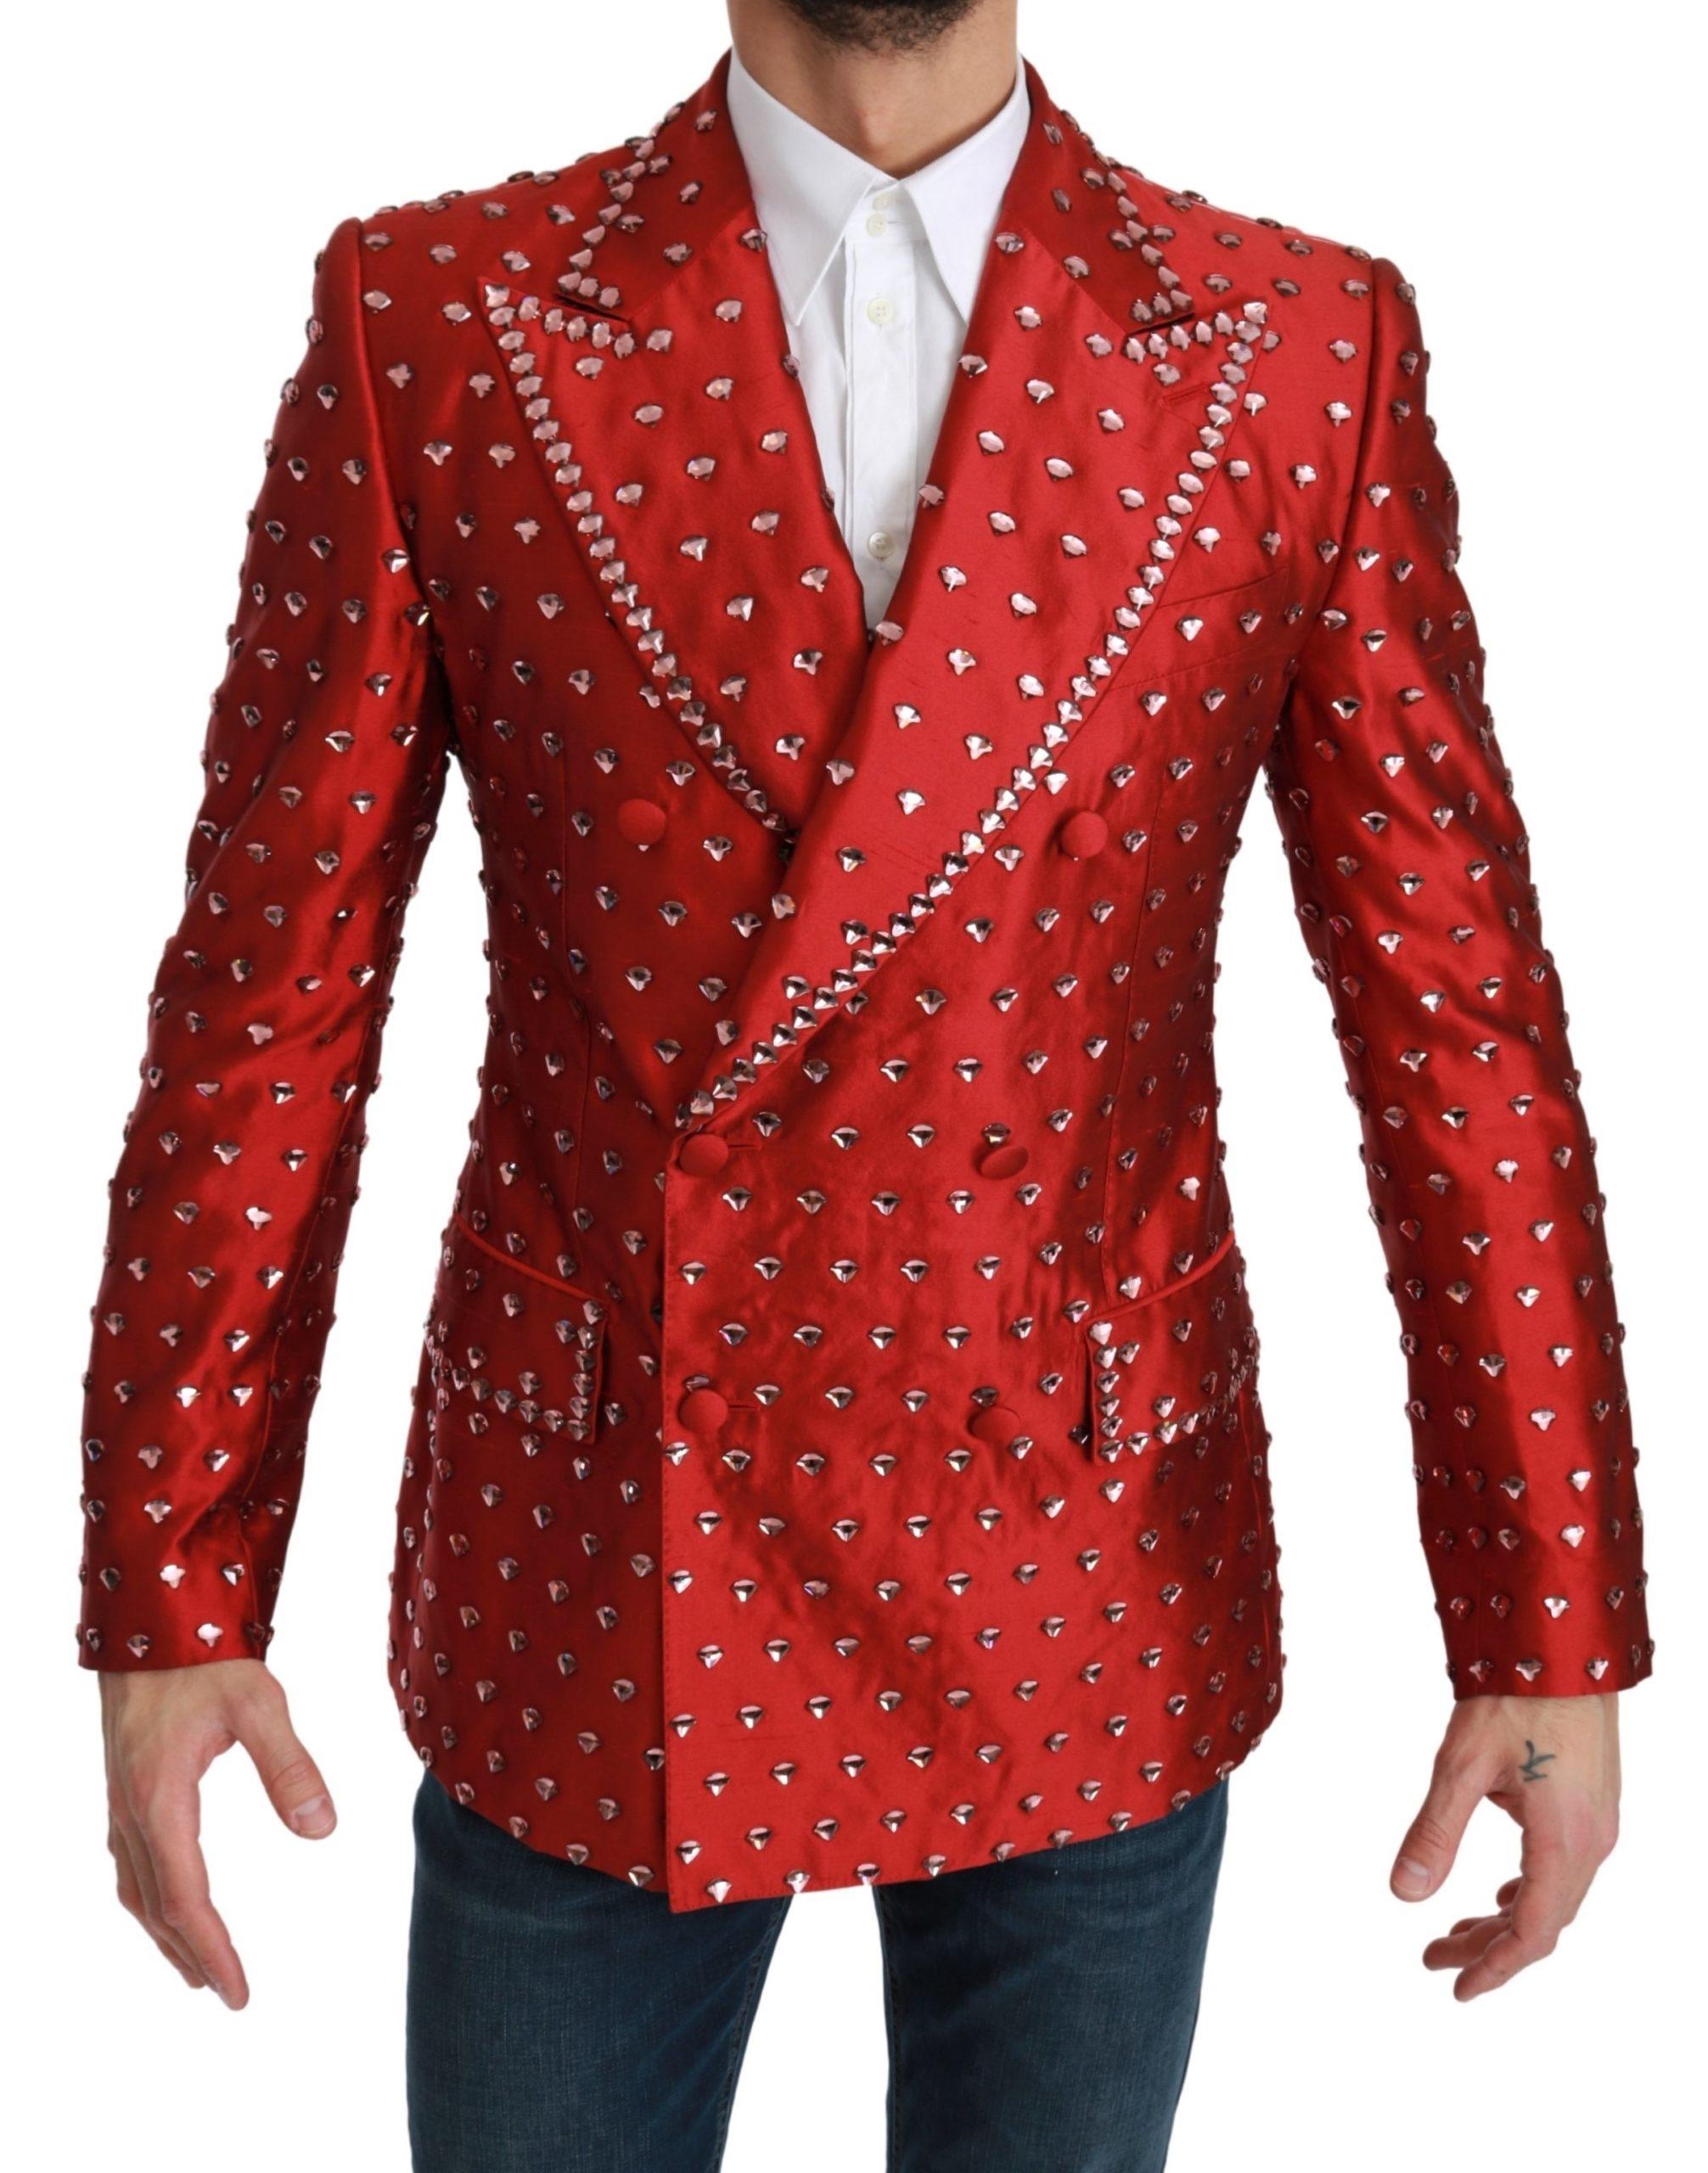 Dolce & Gabbana Men's Silk Crystal Blazer Red KOS1789 - IT48 | M